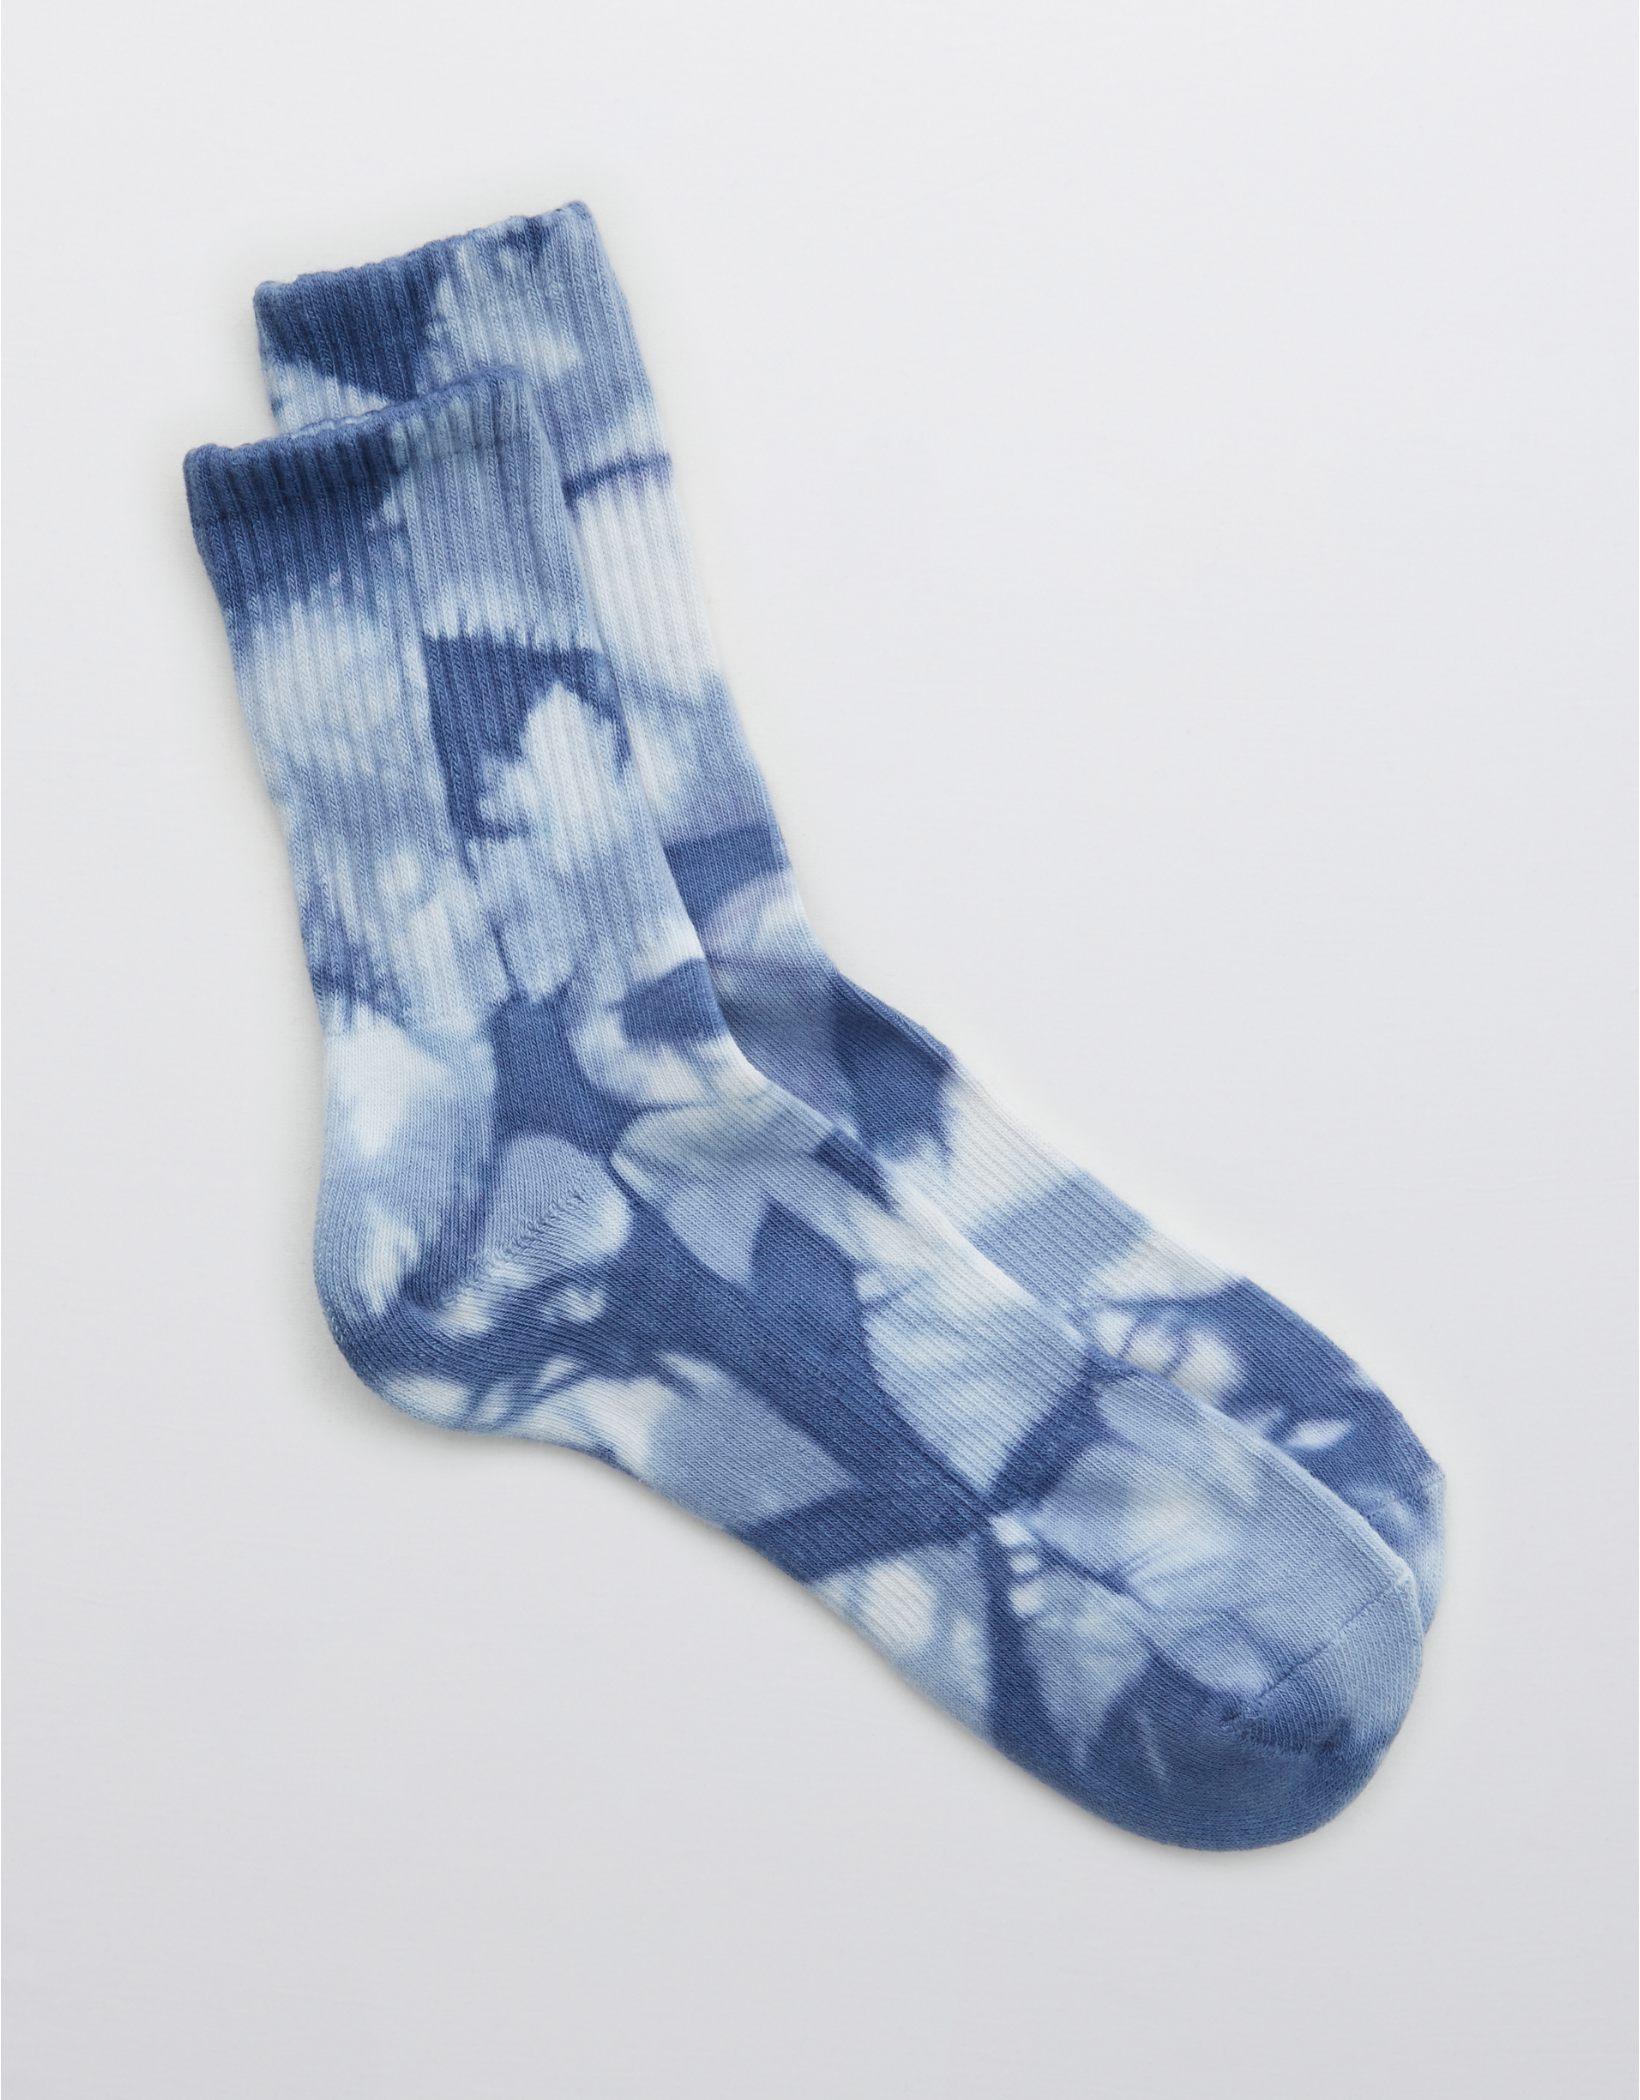 OFFLINE Crew Socks